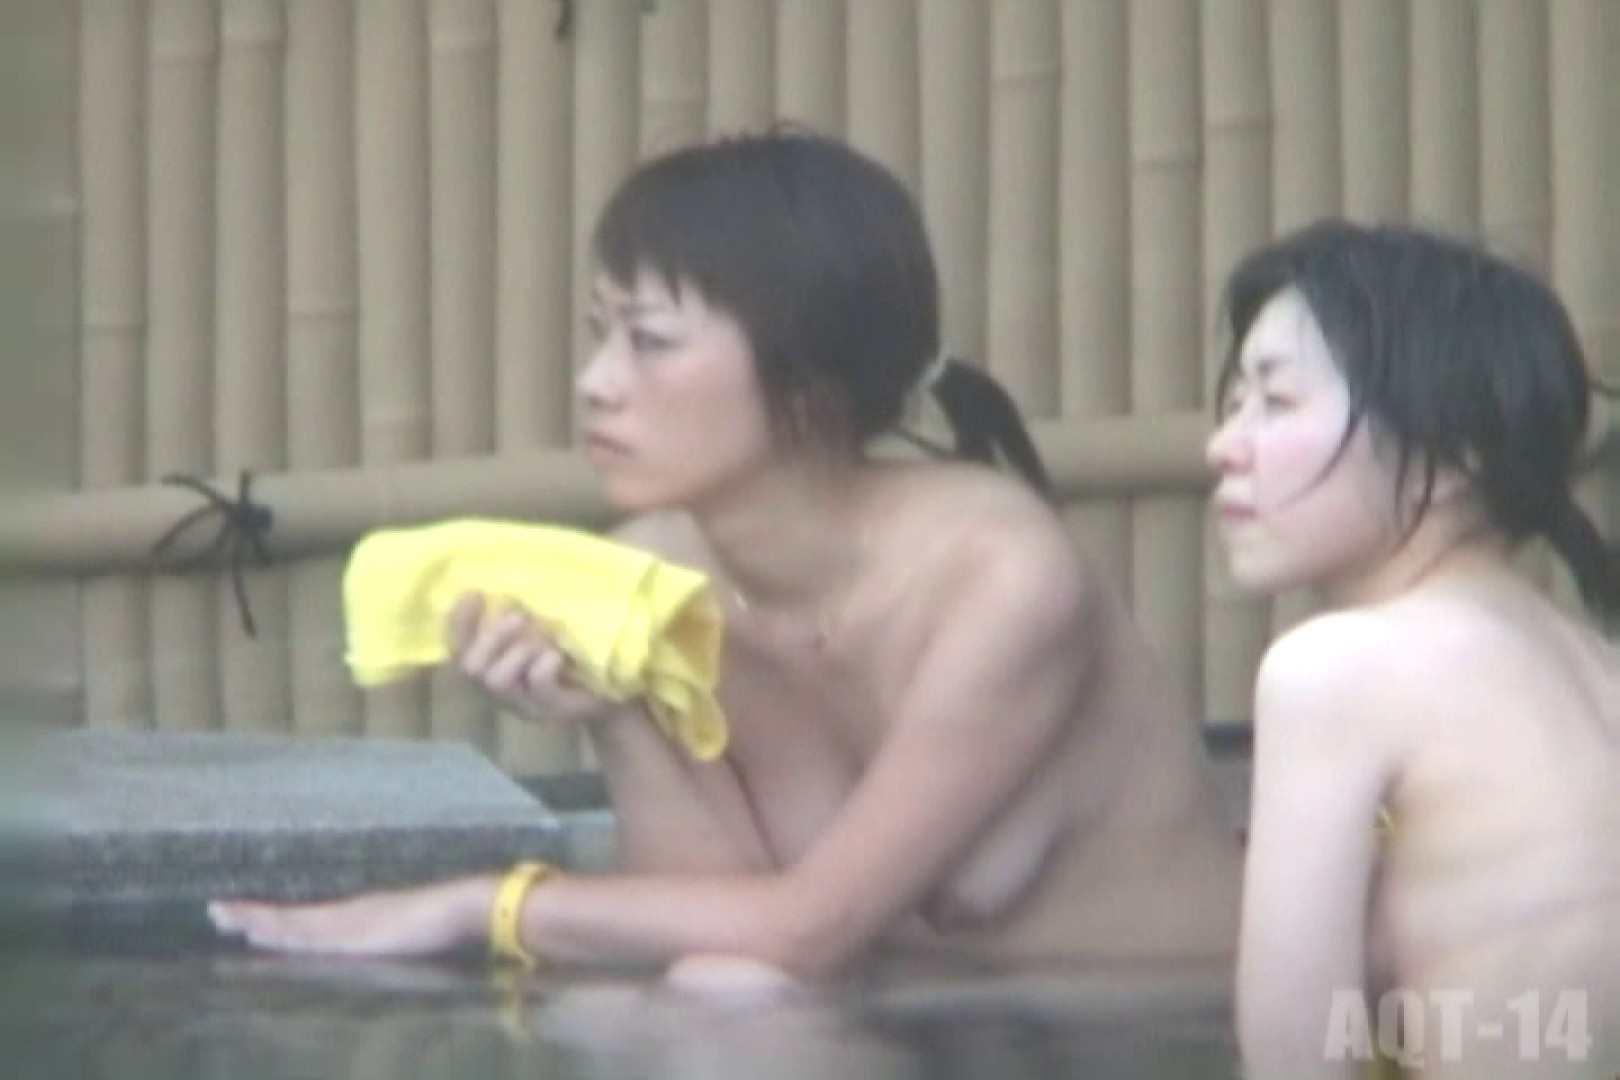 Aquaな露天風呂Vol.828 HなOL | 露天  68pic 9